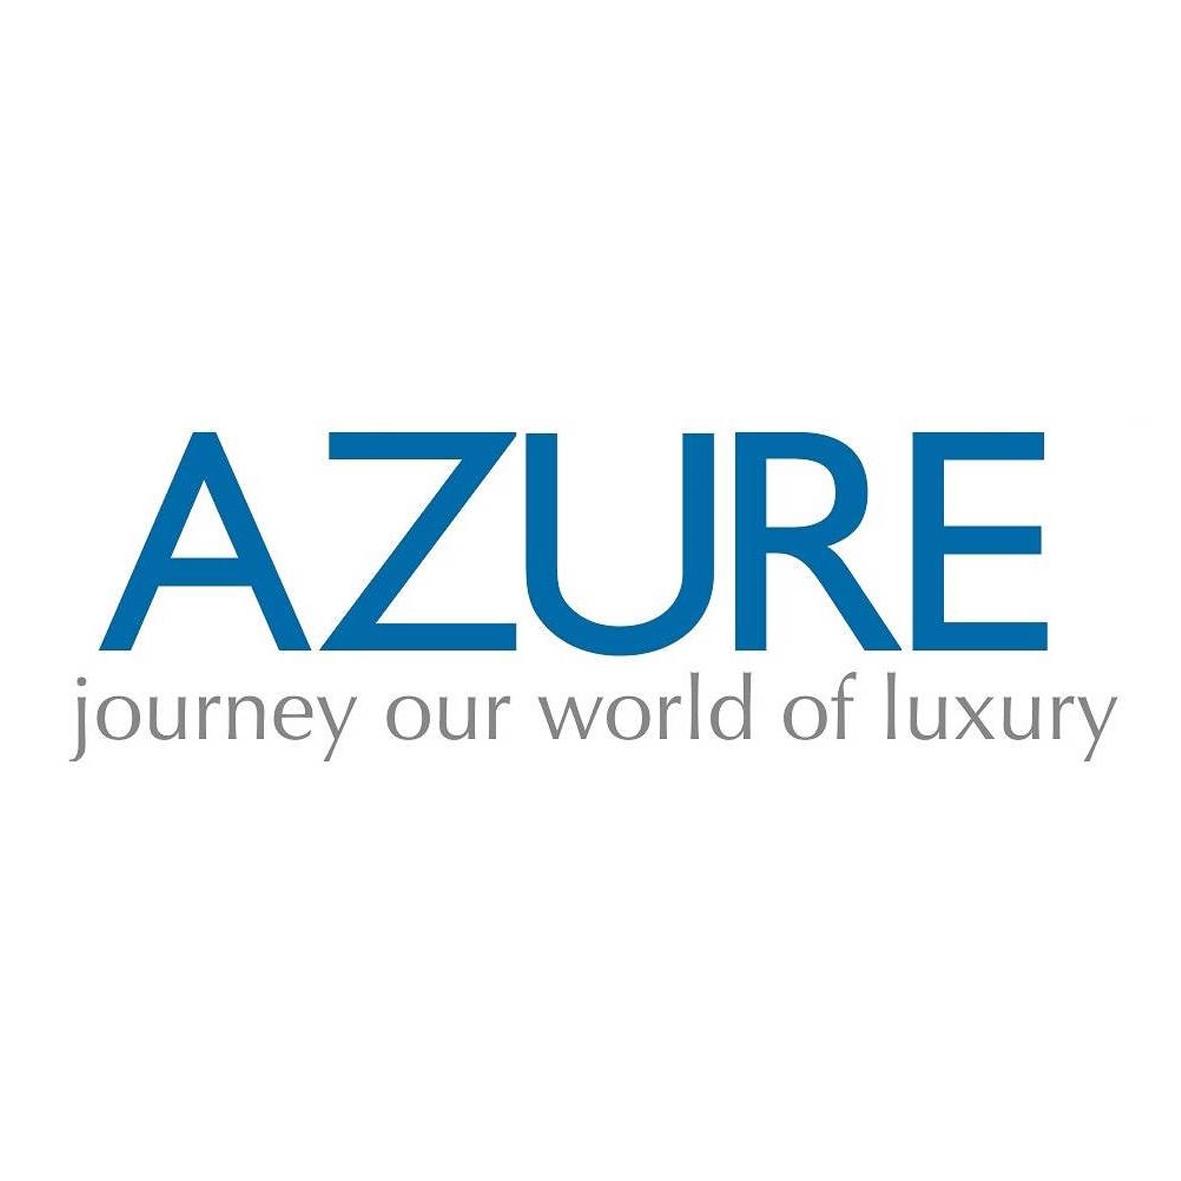 AzureCollection